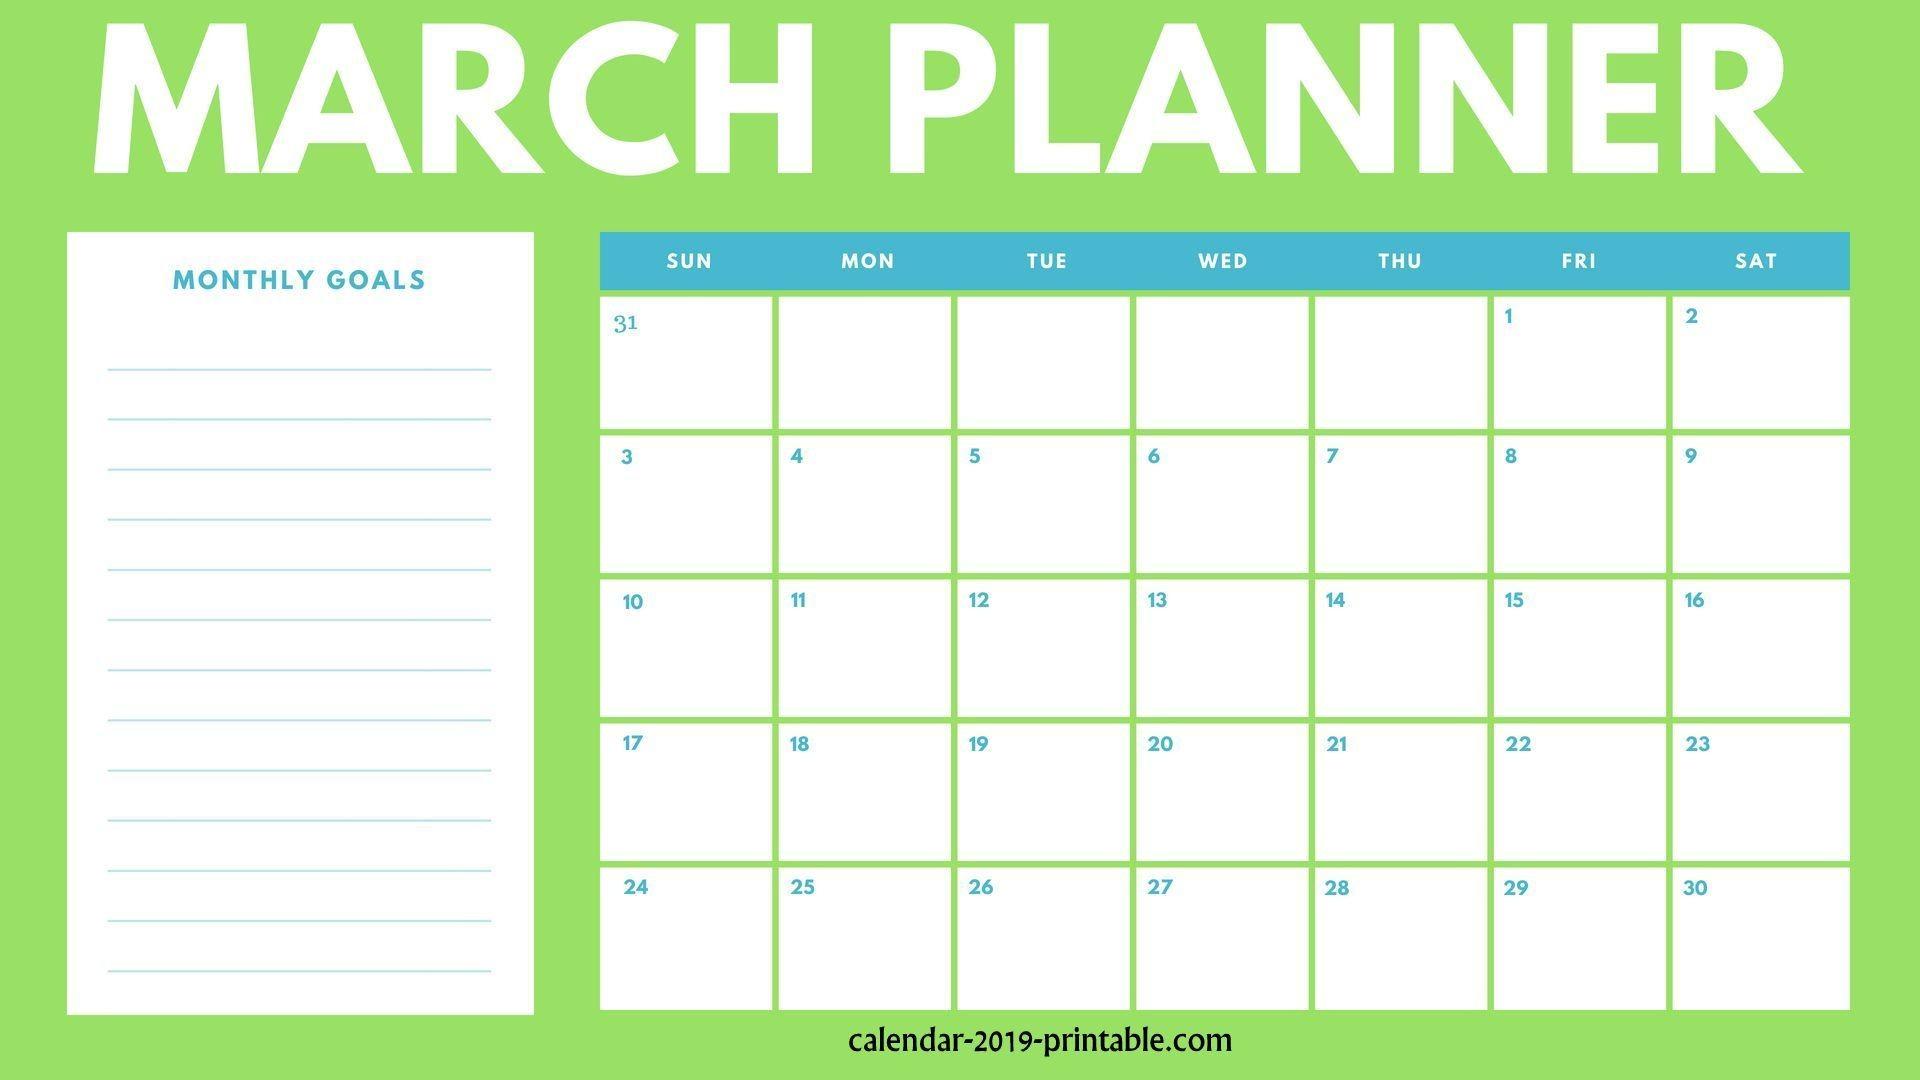 March Calendar Print Out Más Recientes Dec Calendar 2019 Printable Lara Expolicenciaslatam Of March Calendar Print Out Recientes Monthly Calendar 2015 Template Printable 2016 Calendar Templates